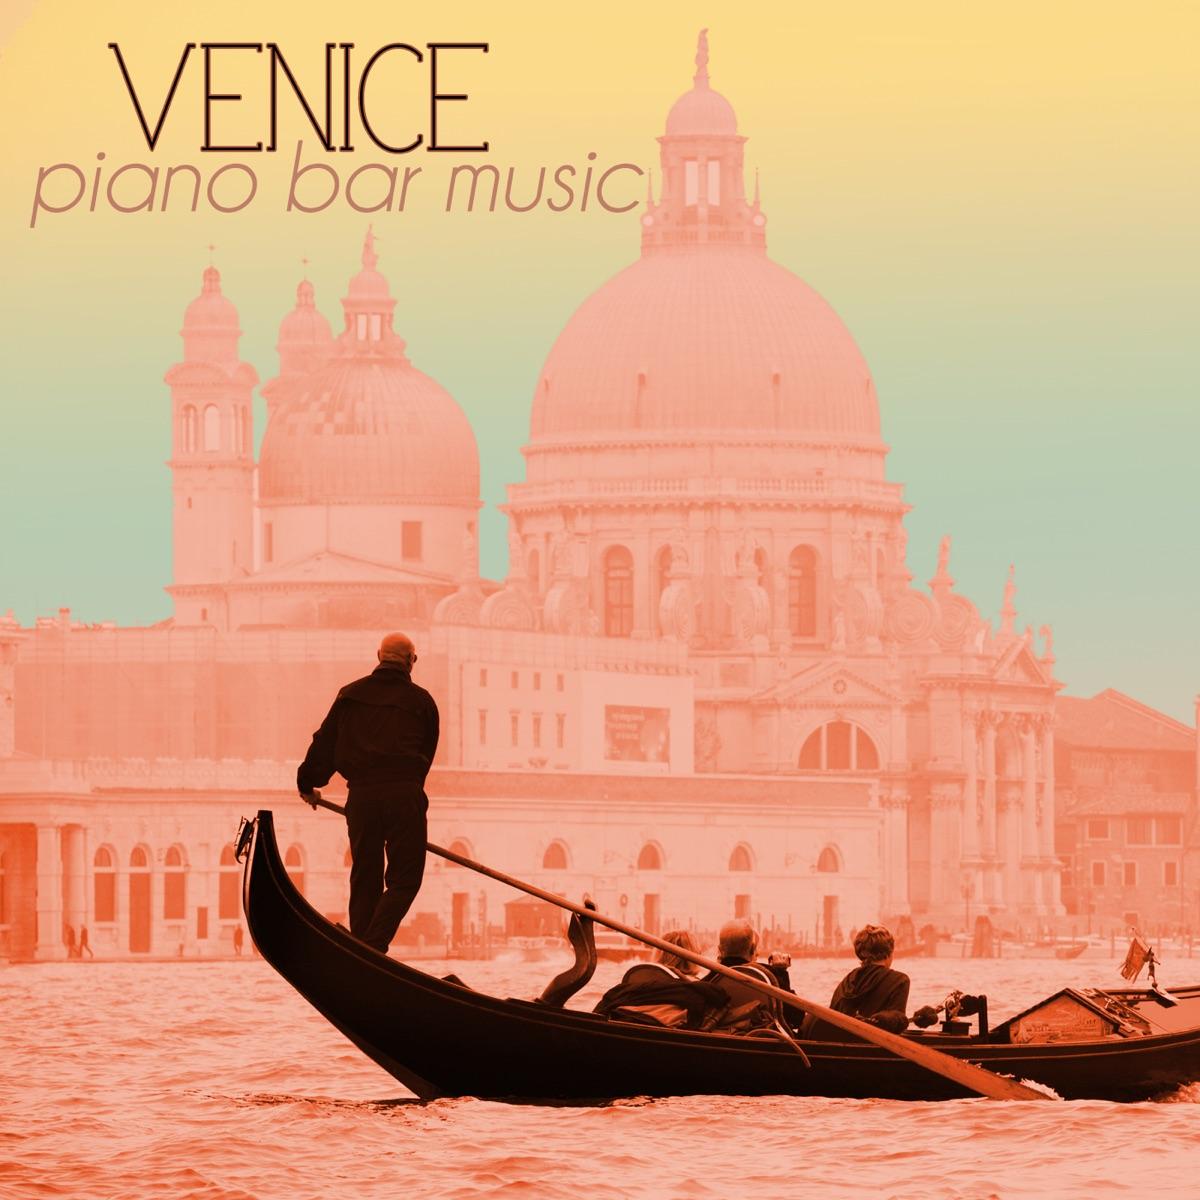 Venice Piano Bar Music - Italian Cocktail Party & Drinking